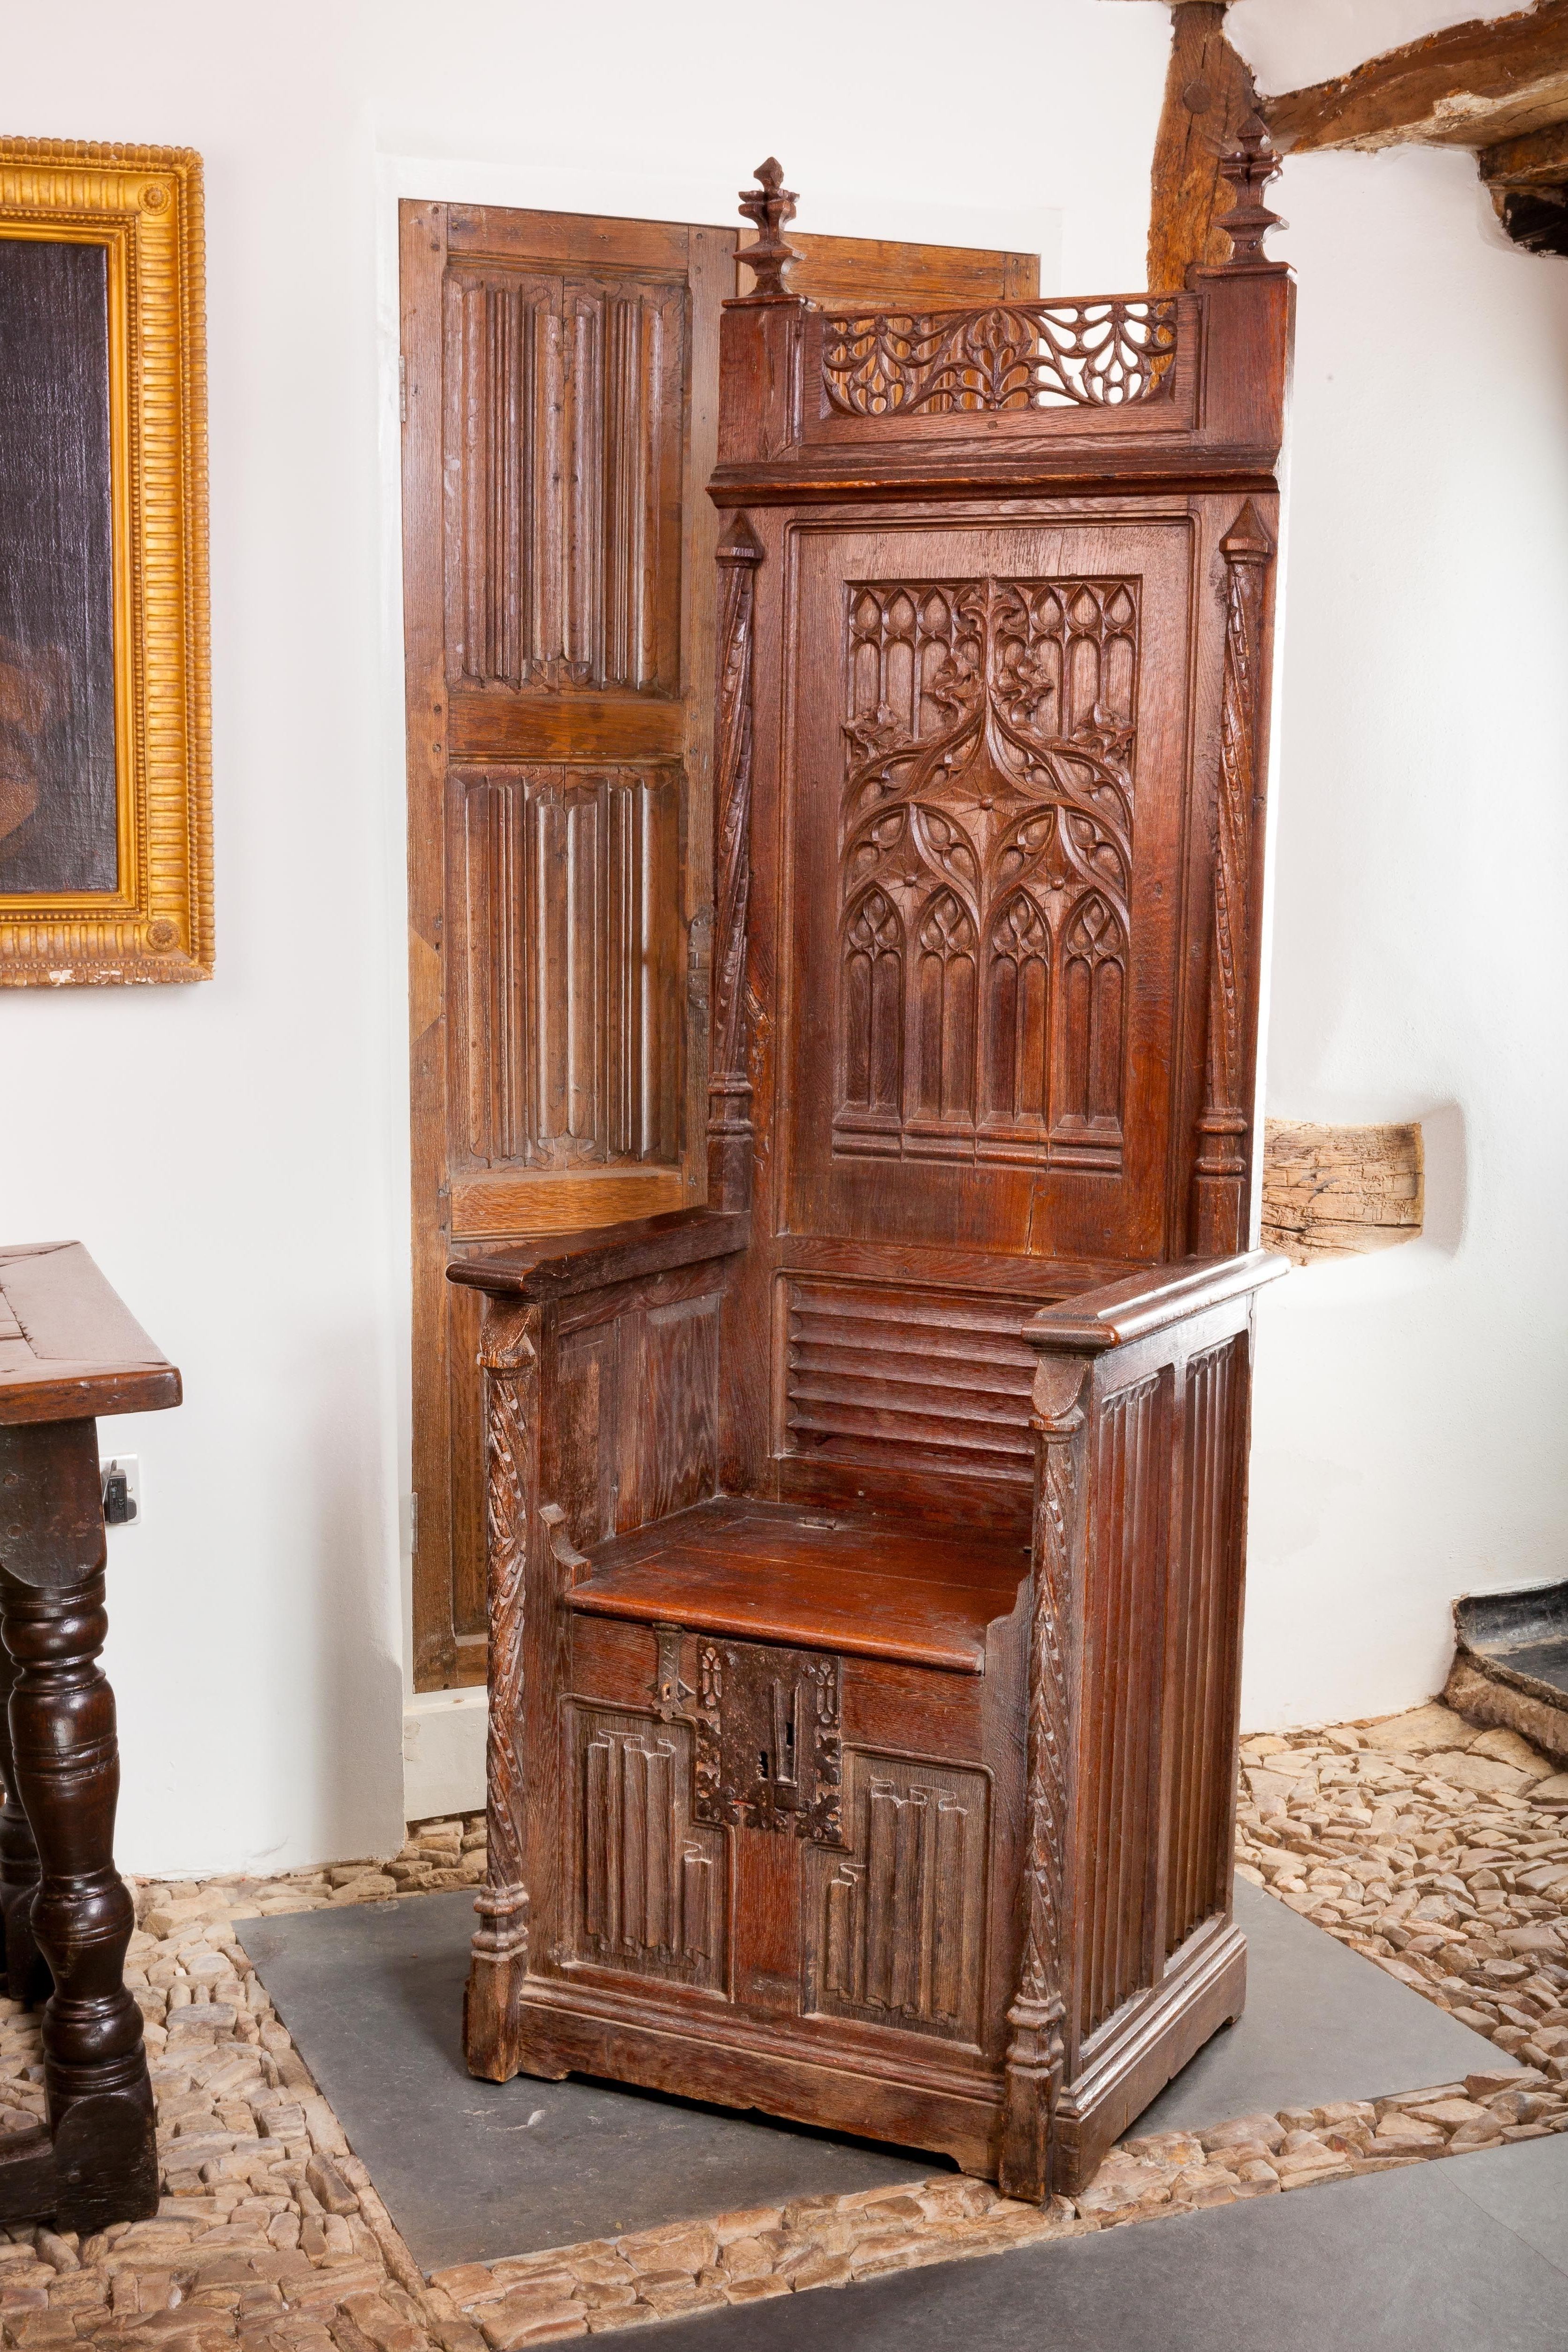 Most Popular Gothic Sofas Regarding Gothic Throne Chair, Circa 1460 – 1480, Marhamchurch Antiques (View 12 of 15)